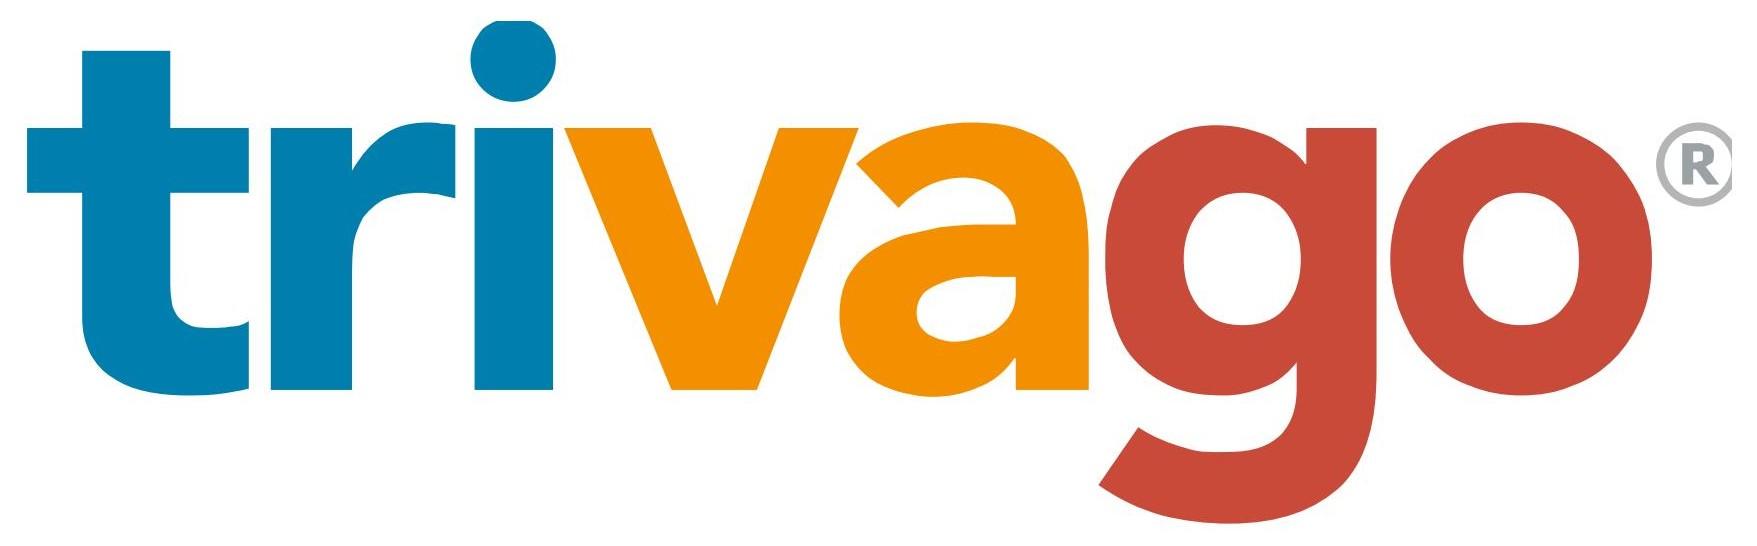 Trivago Logo [PDF] - Trivago Logo PNG